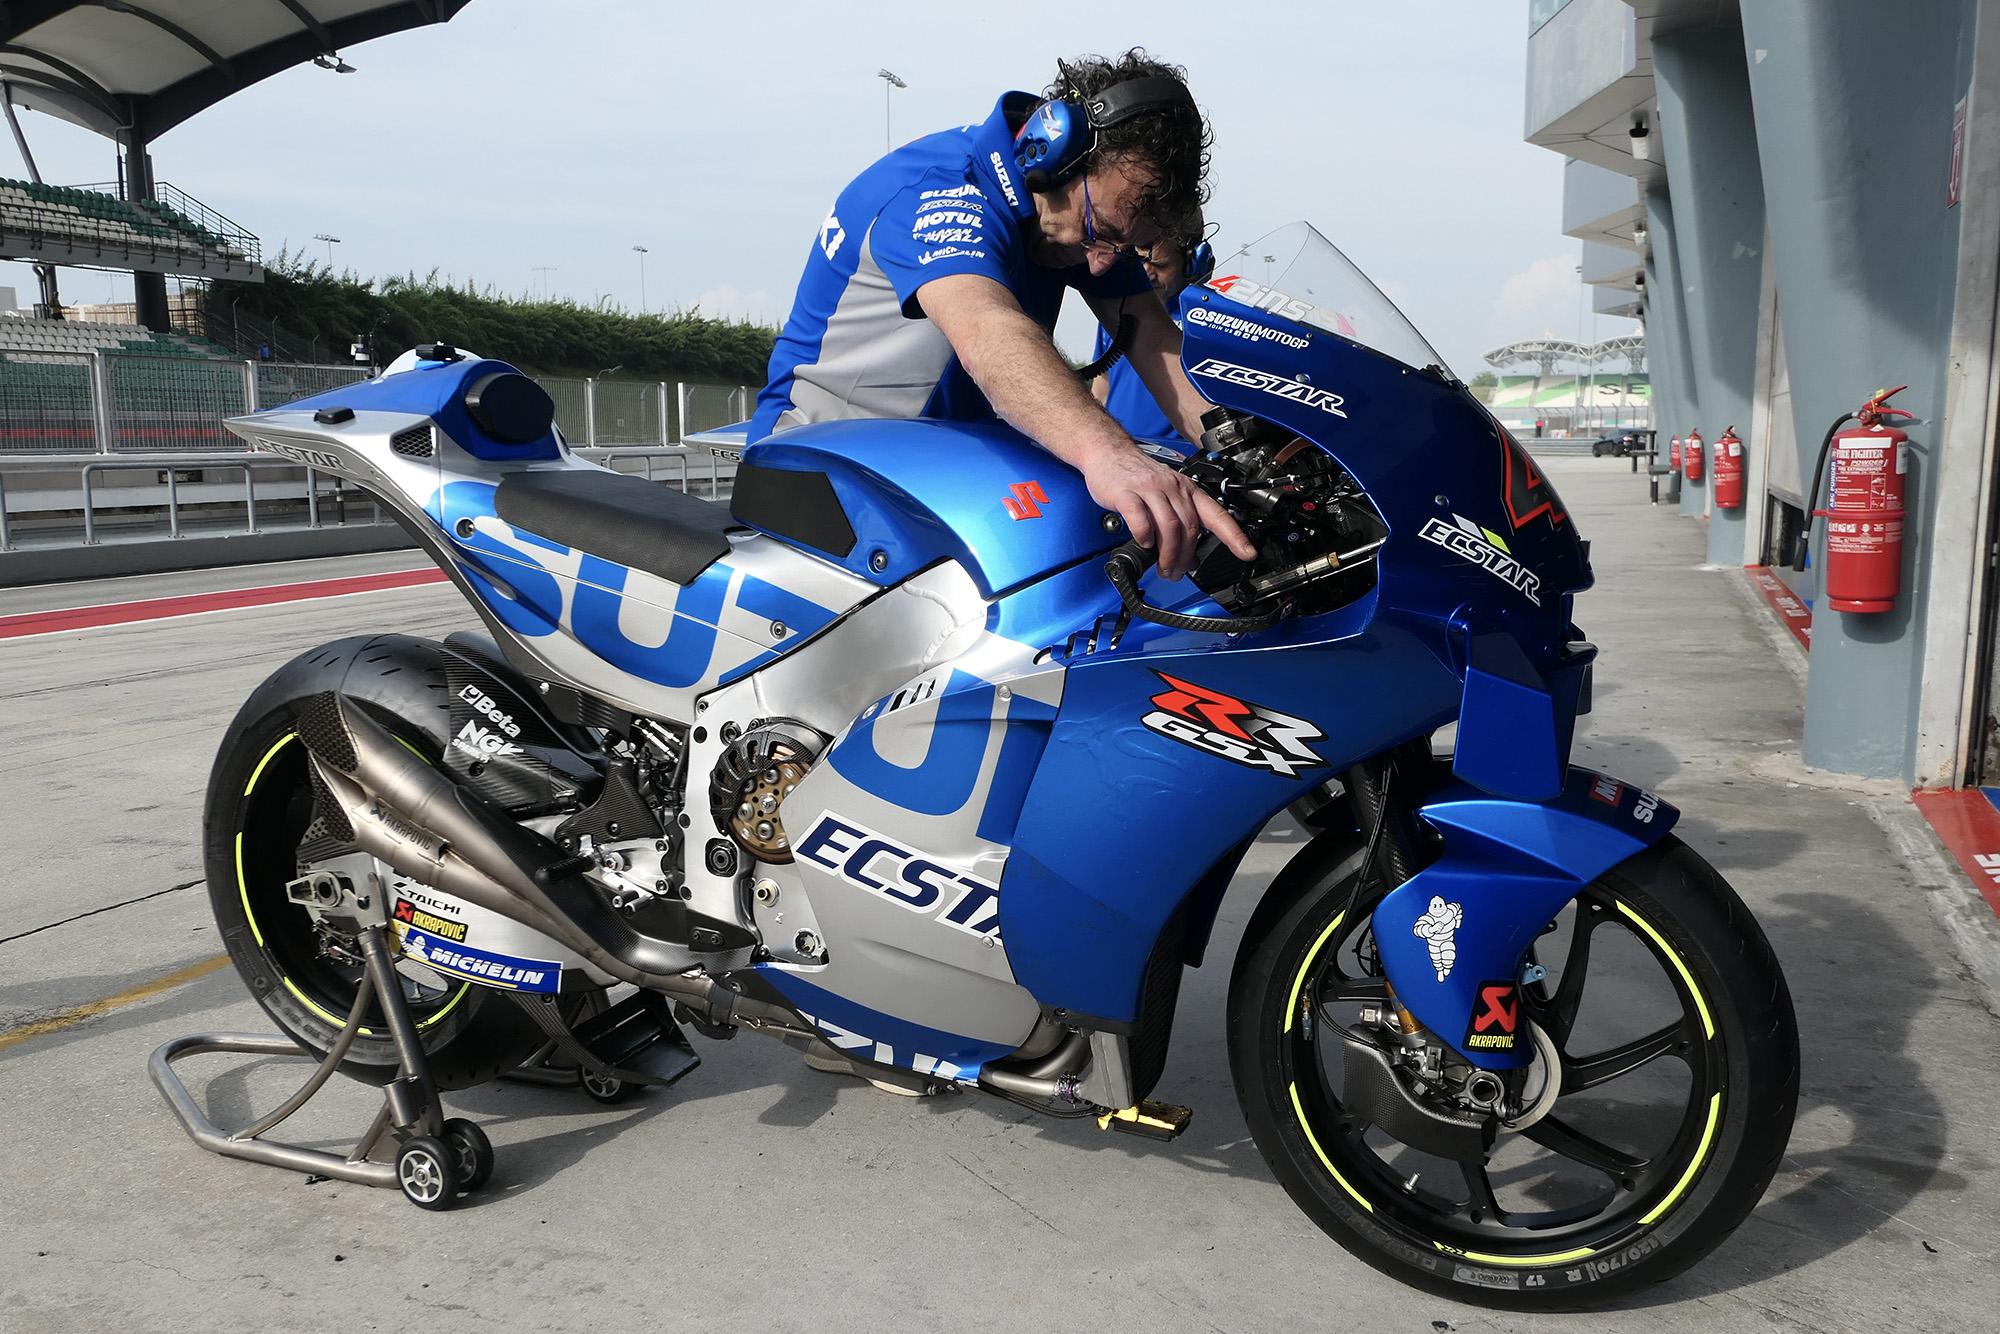 Side view of the Suzuki at 2020 MotoGP Sepang testing